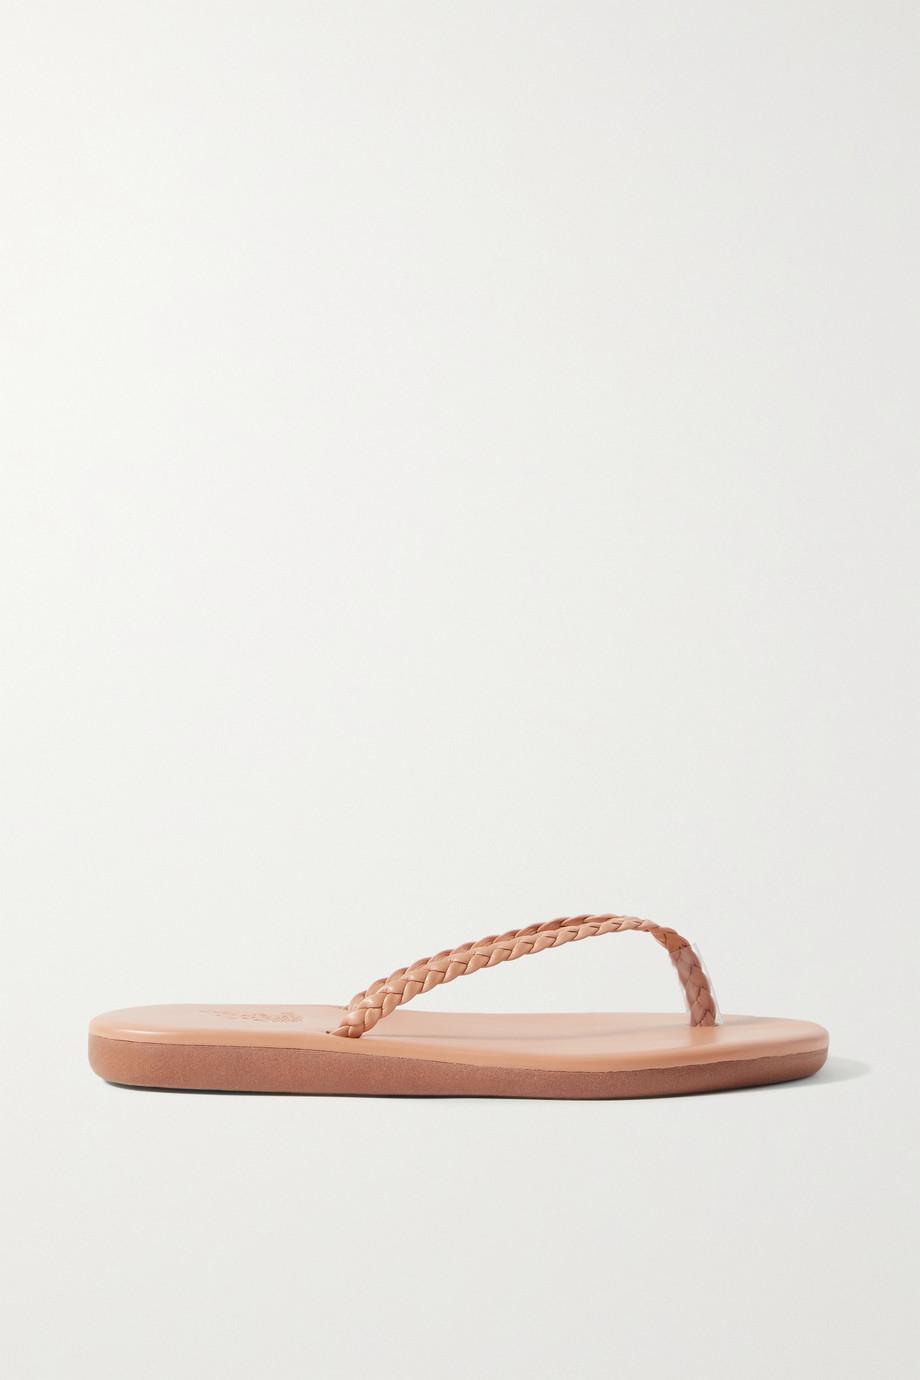 Ancient Greek Sandals Tongs en cuir tressé Plage